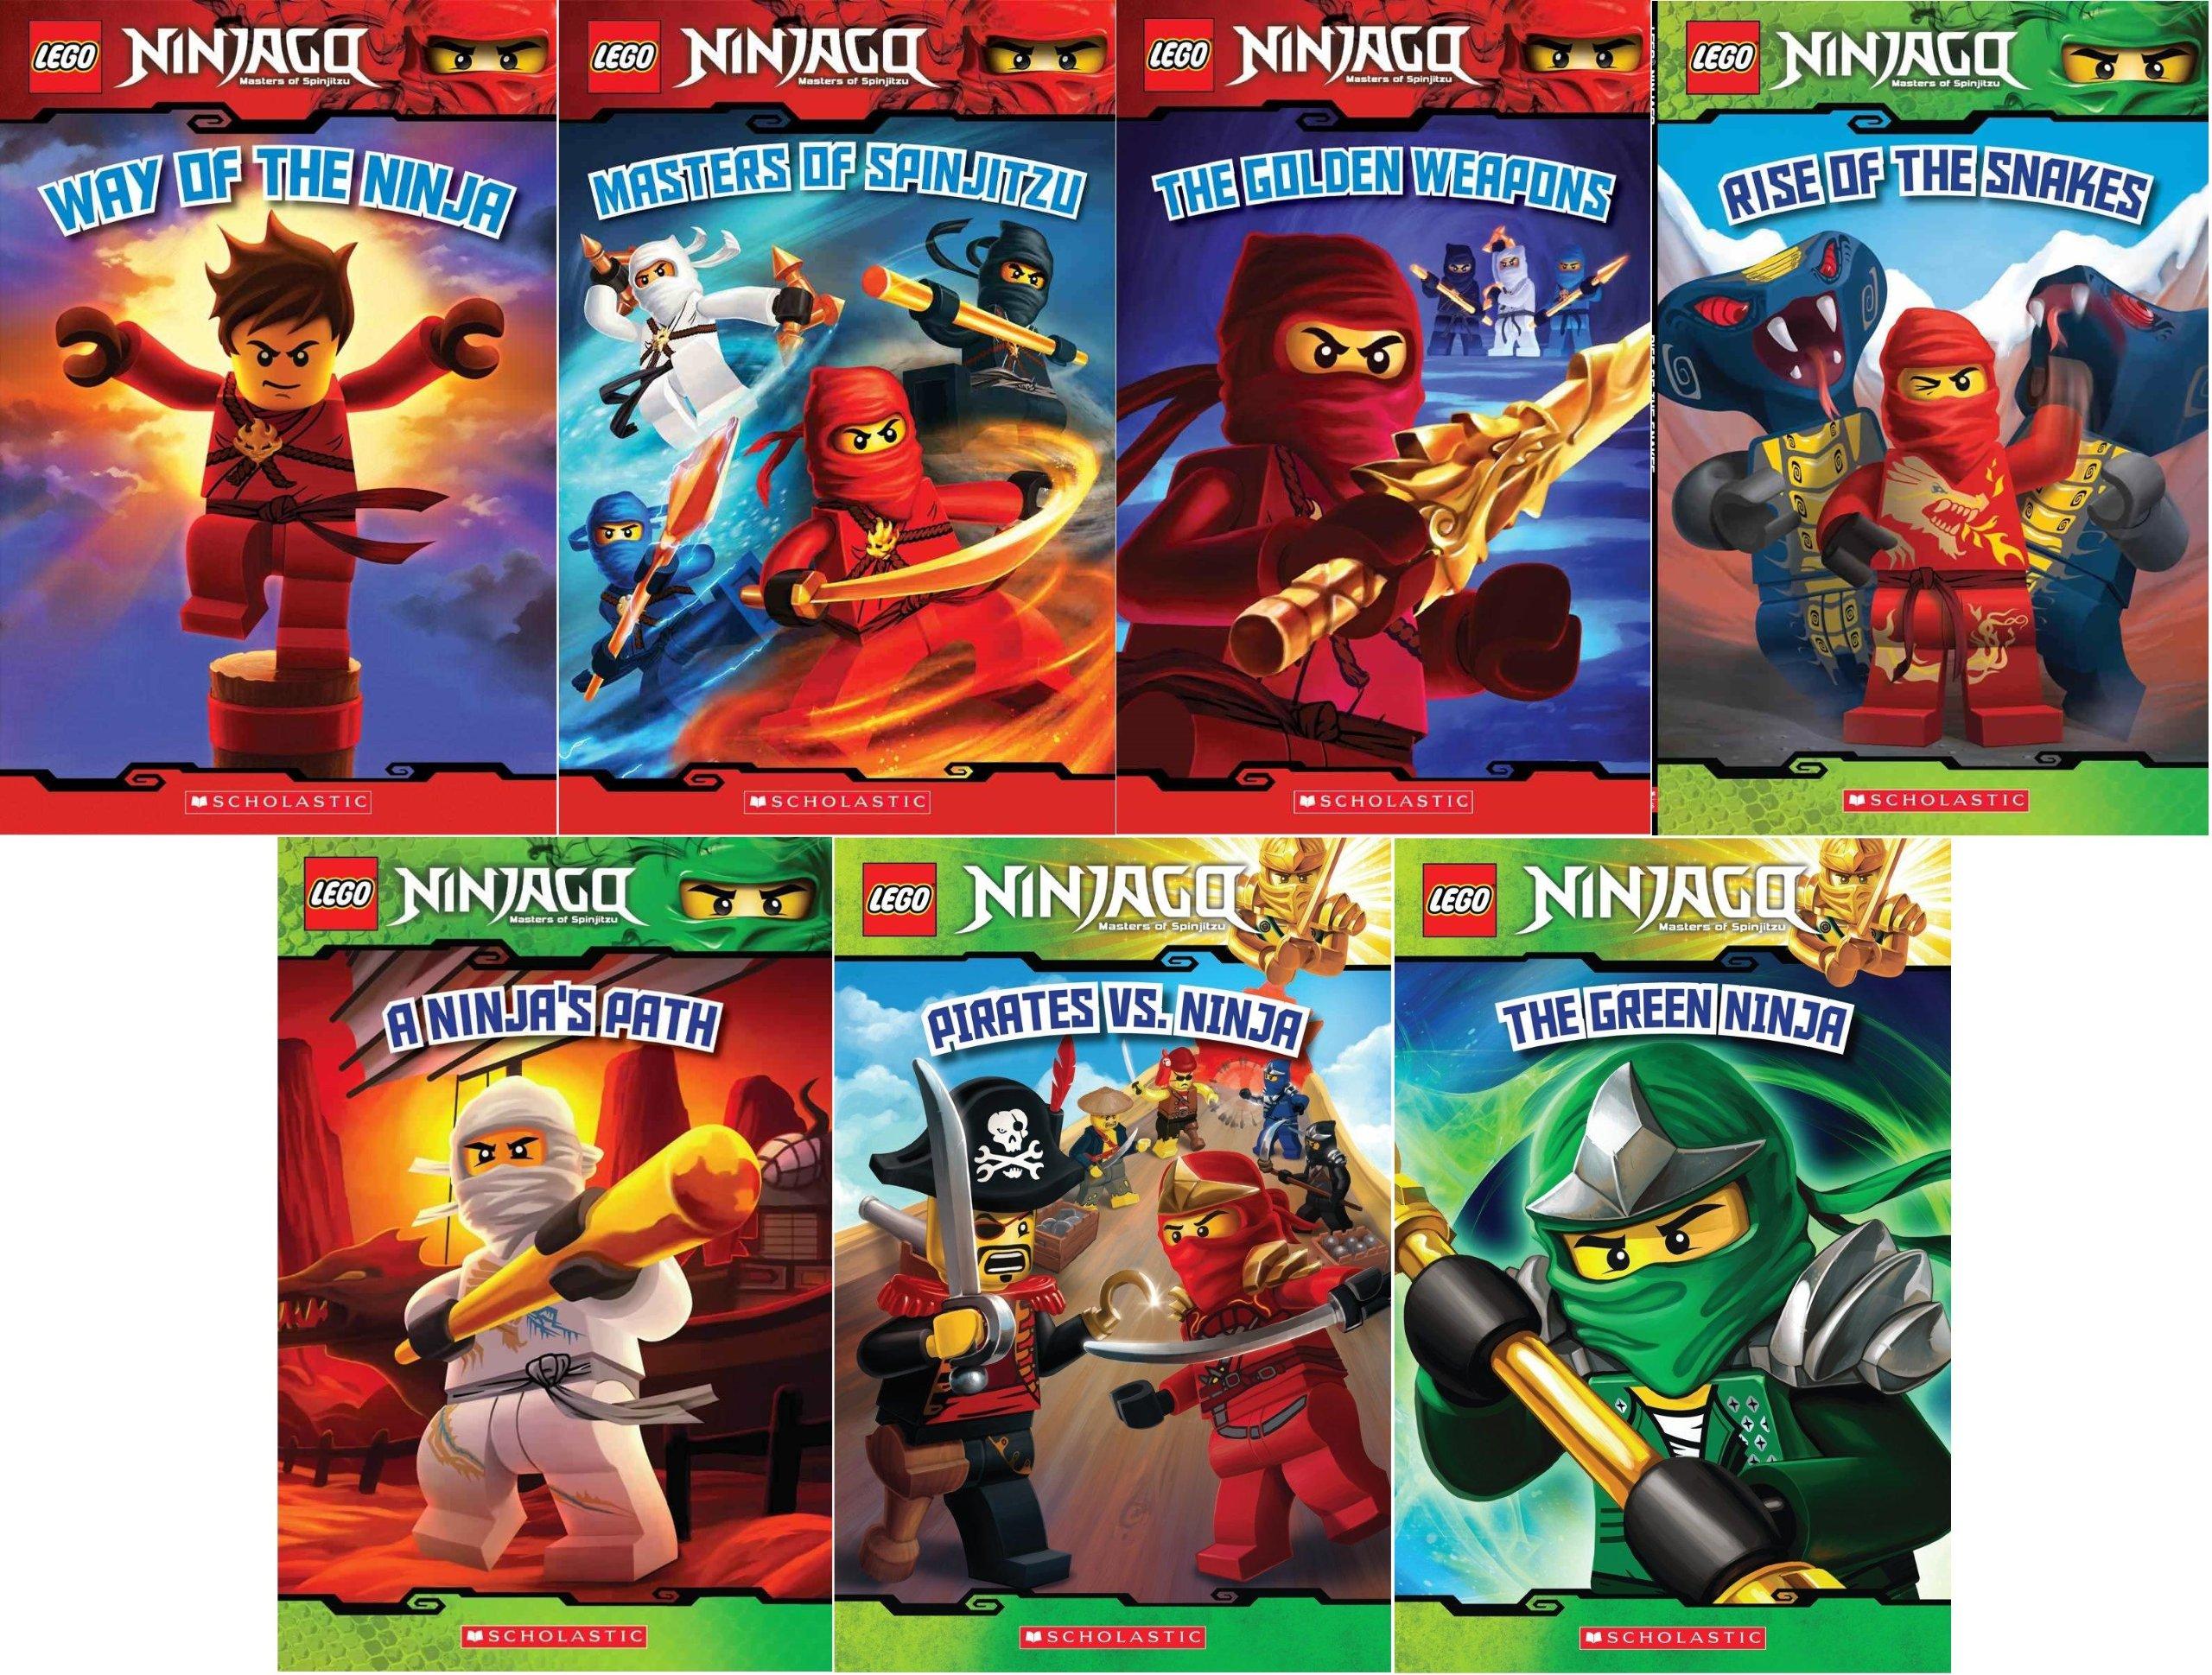 LEGO« Ninjago Reader Pack: 7 Book Set: #1: Way of the Ninja ...